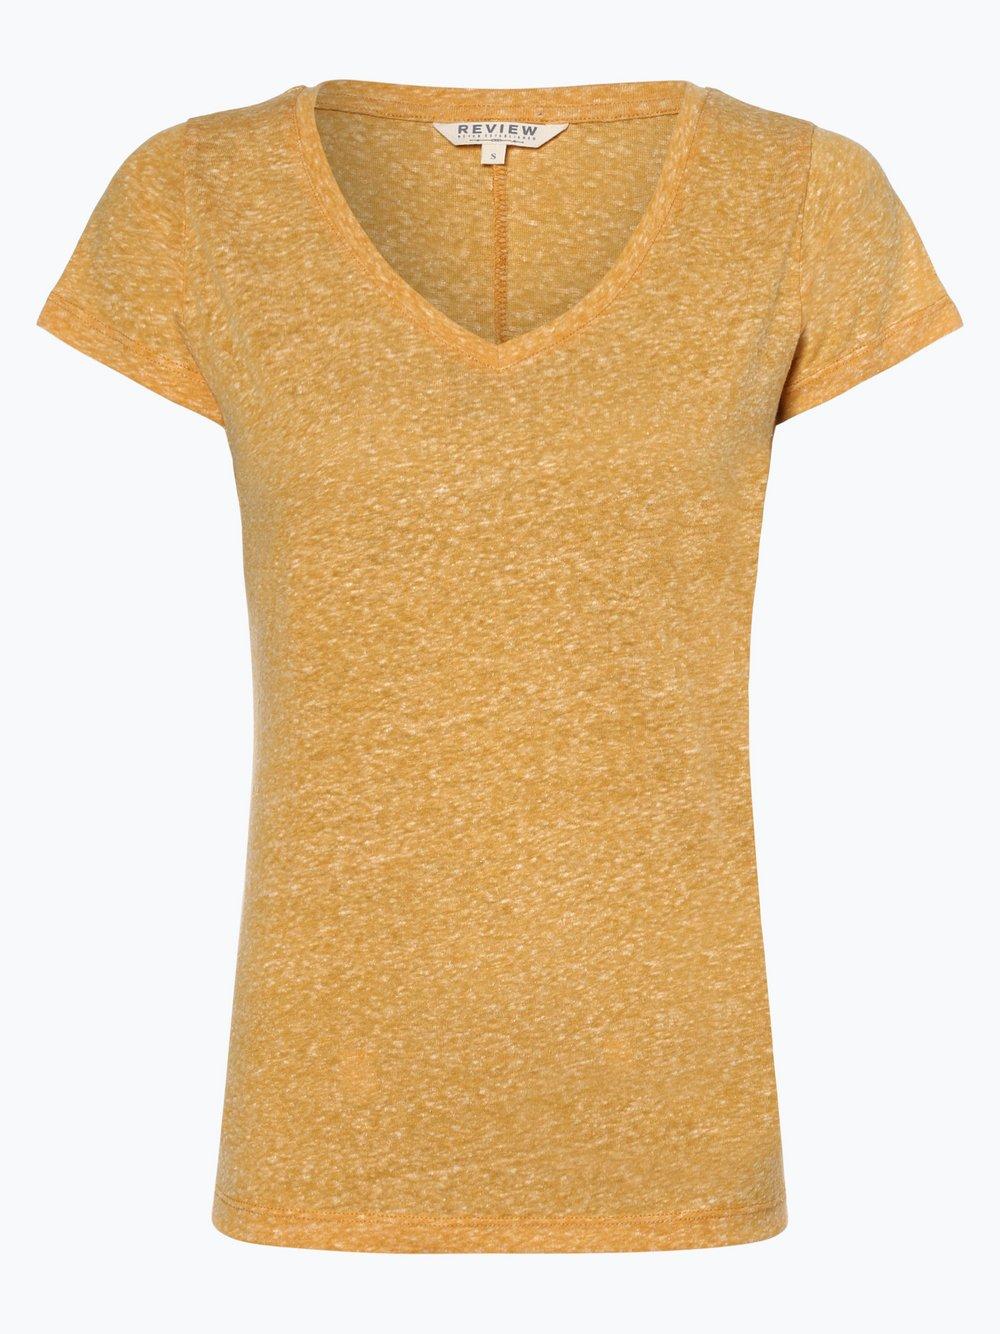 Review - T-shirt damski, żółty Review